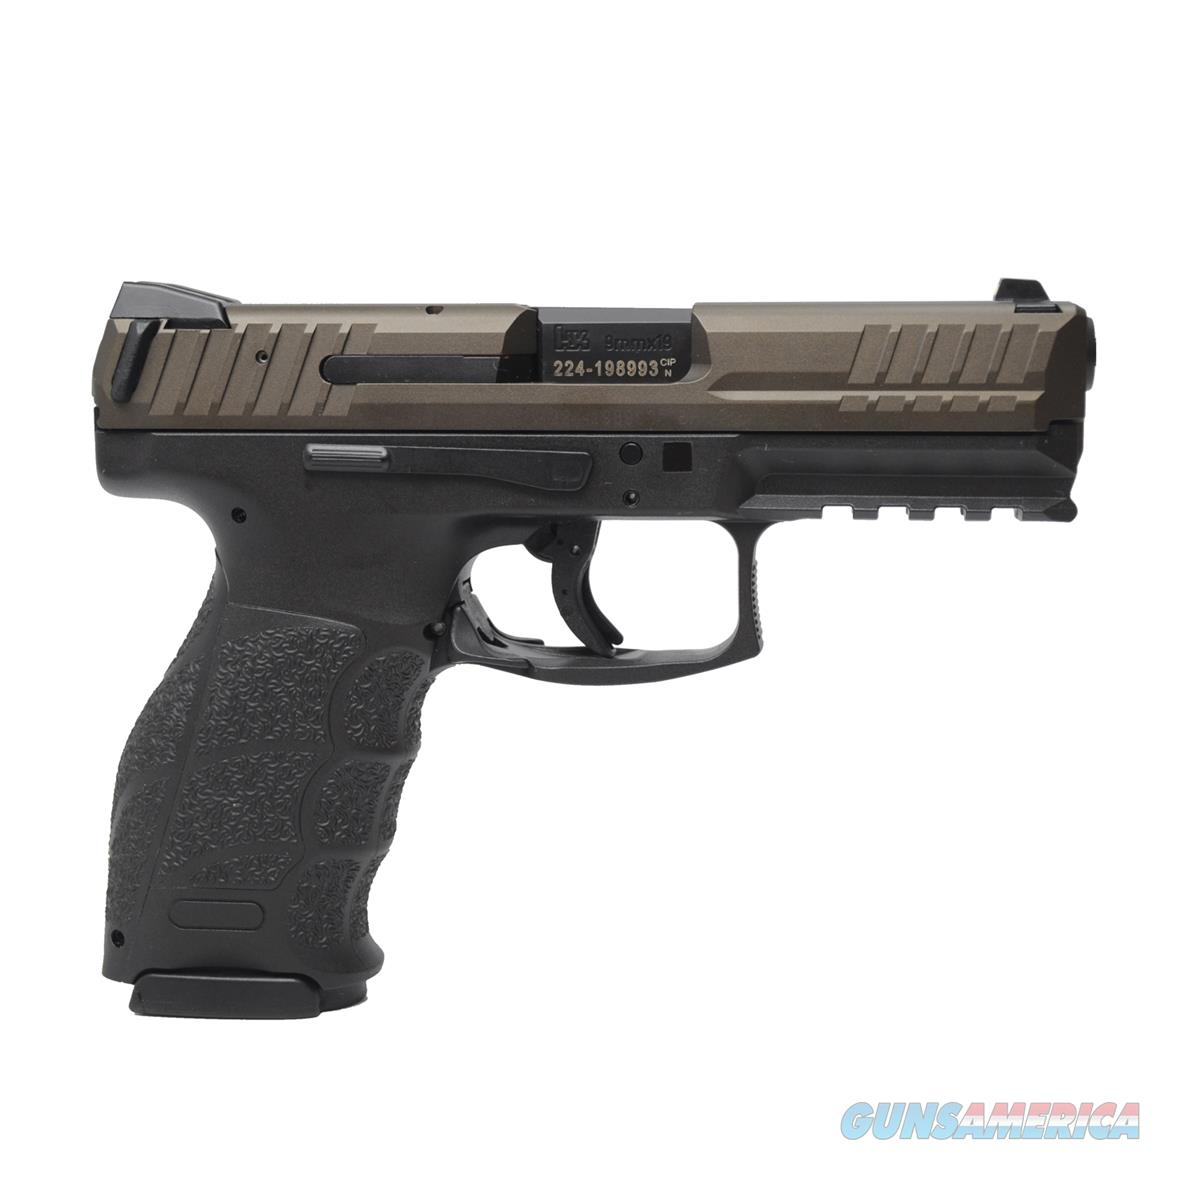 H&K VP9 9mm 15+1 Pistol with Night Sights and 3-15 round magazines 81000139 642230256897  Guns > Pistols > Heckler & Koch Pistols > Polymer Frame